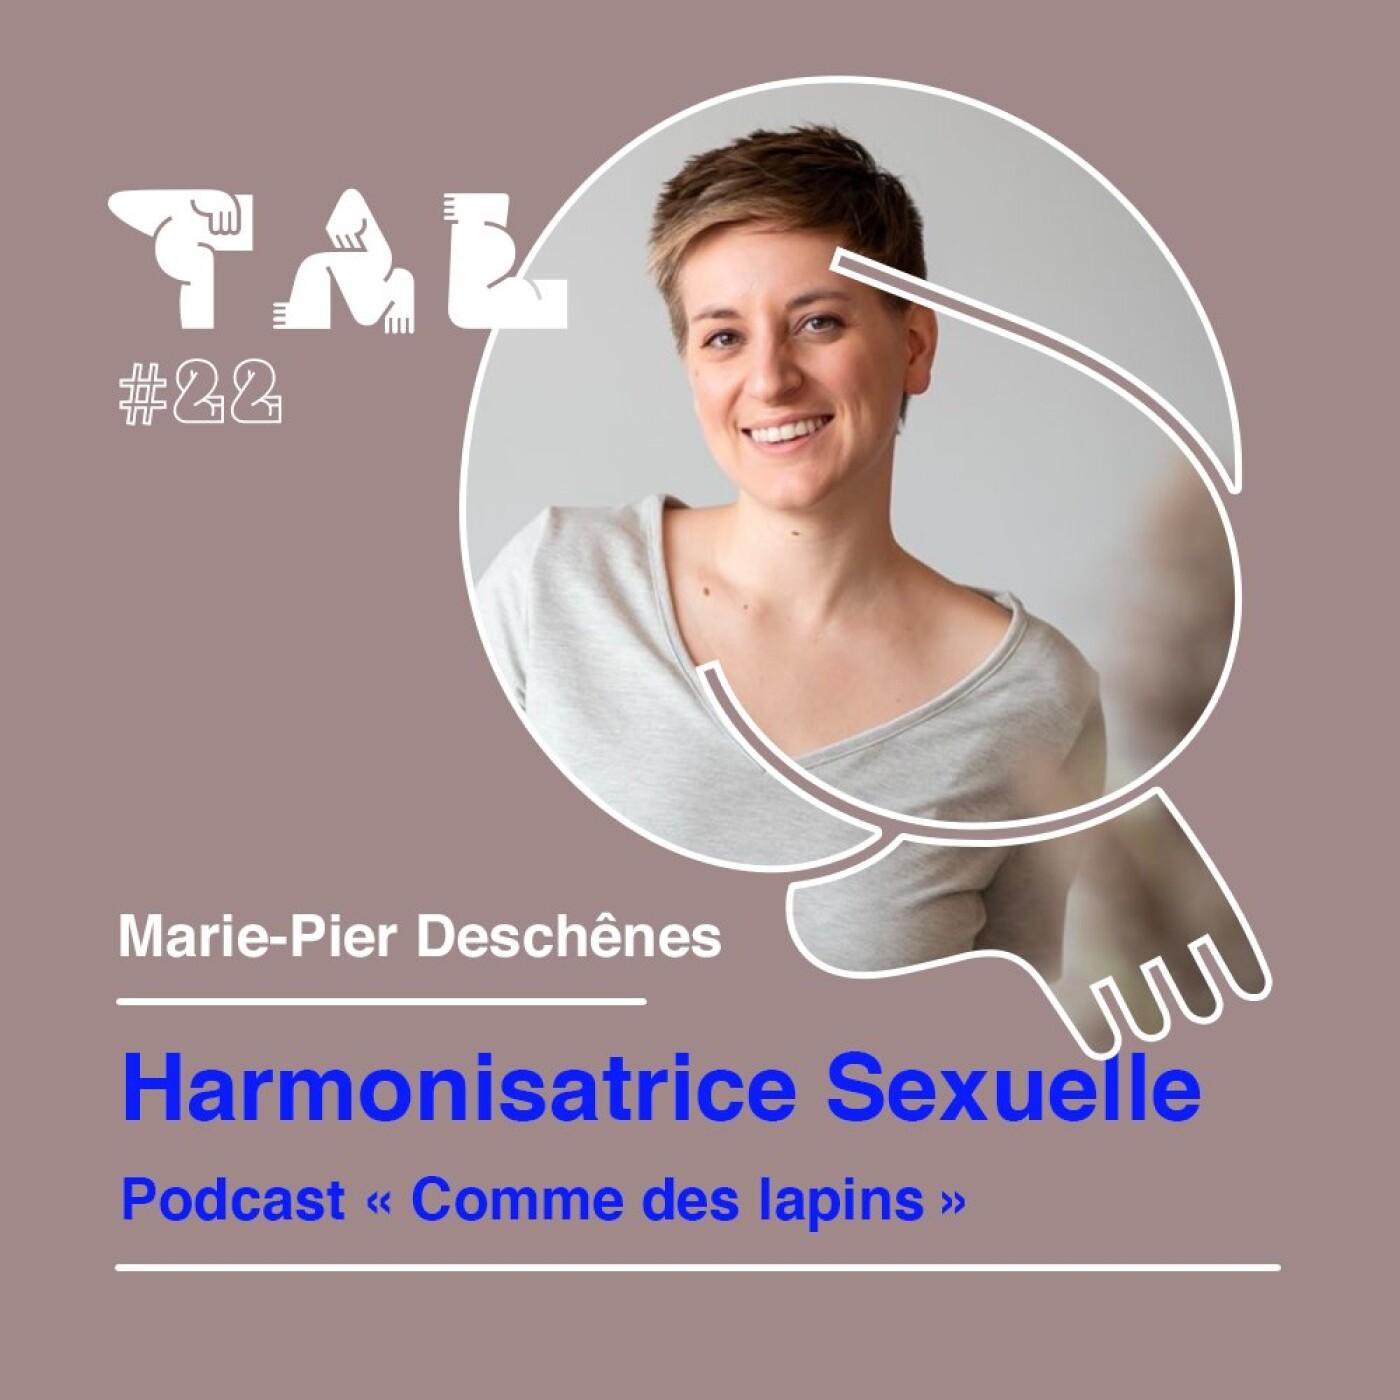 #22 - Marie-Pier Deschênes : Harmonisatrice sexuelle